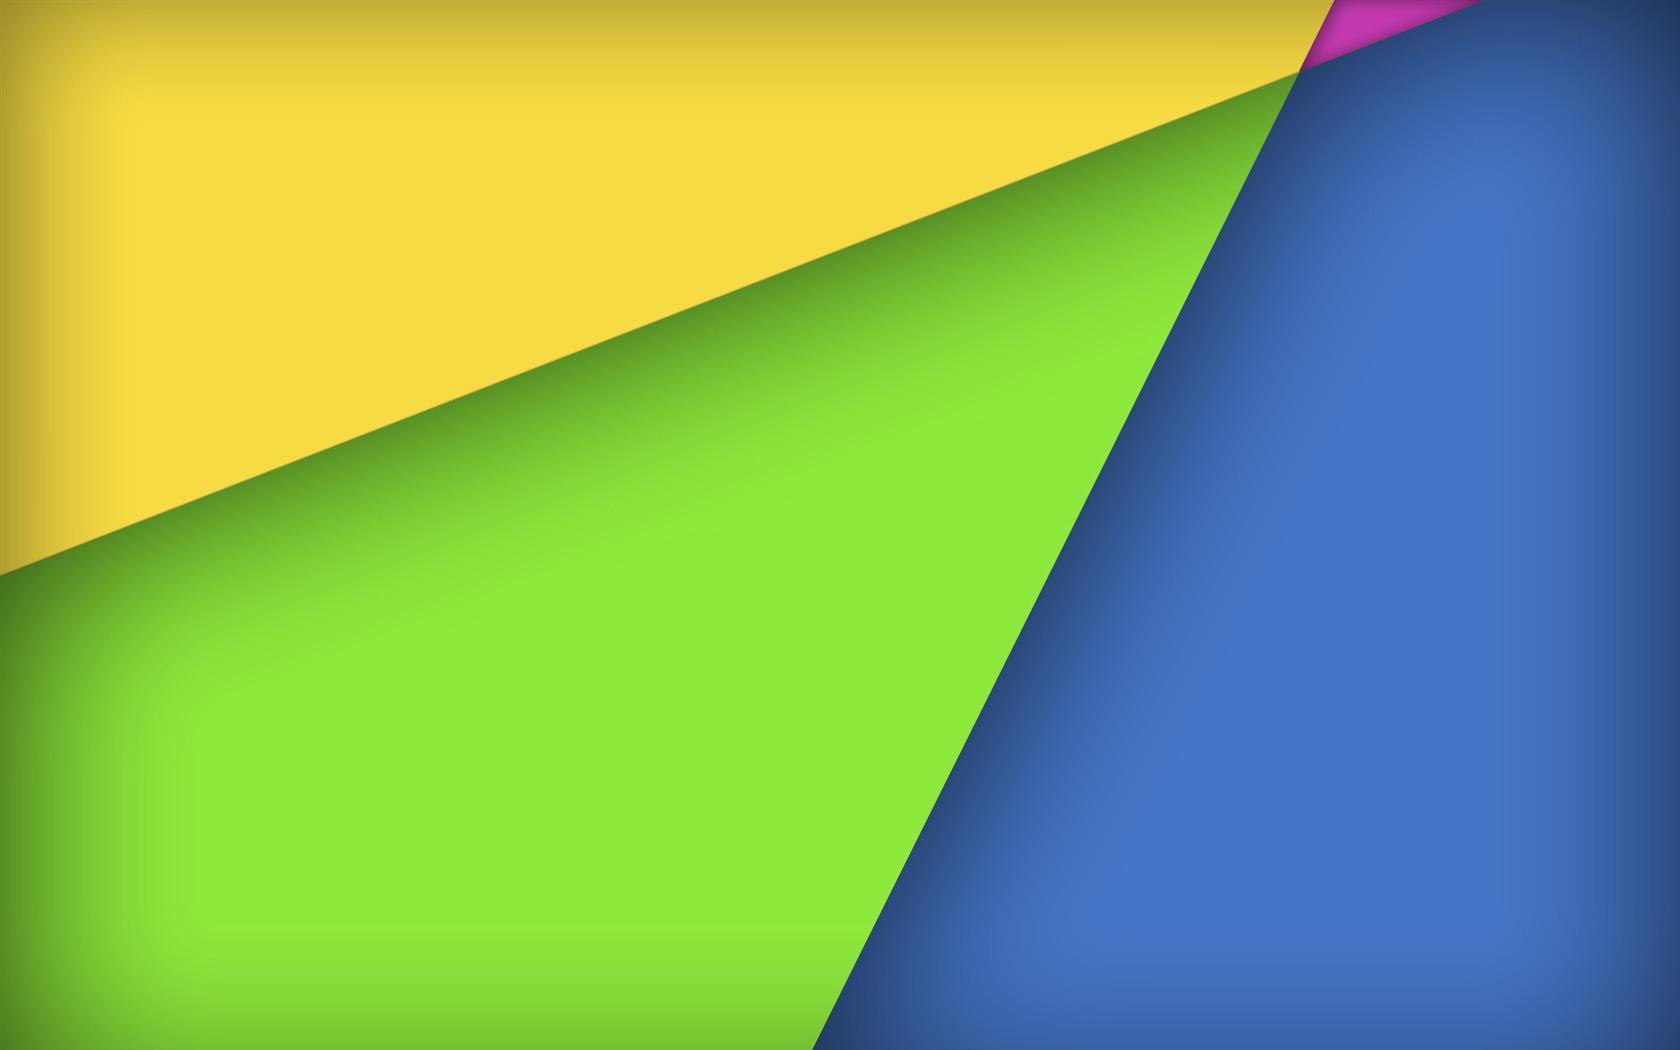 1680x1050px Nexus 7 Hd Wallpaper Wallpapersafari